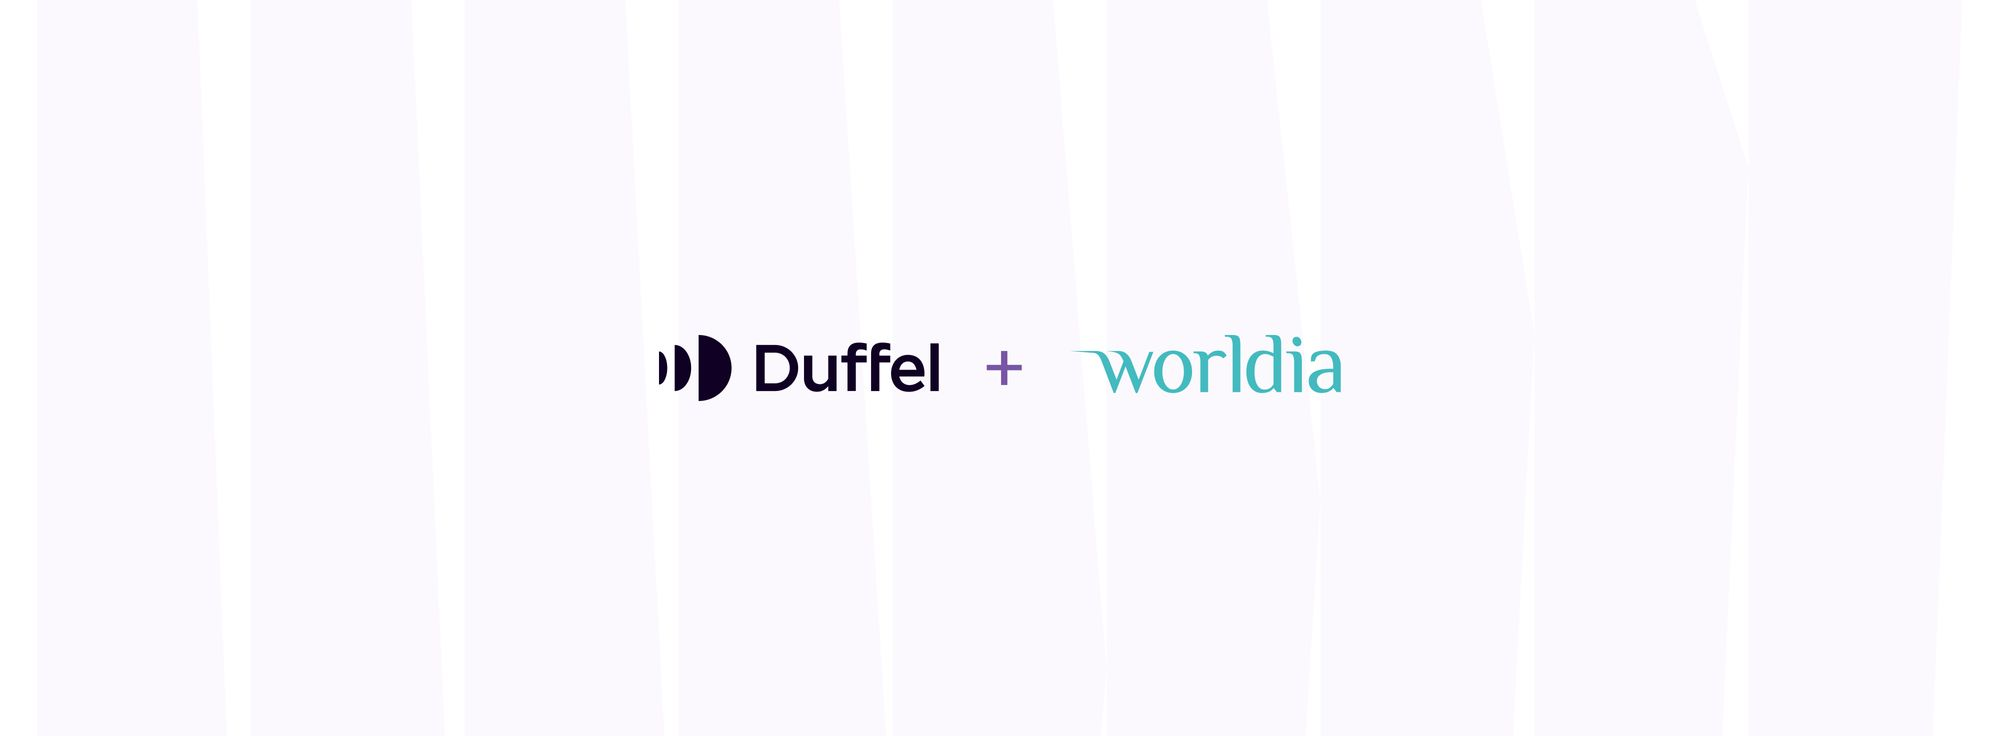 Three criteria Worldia used to select Duffel as their flights API provider